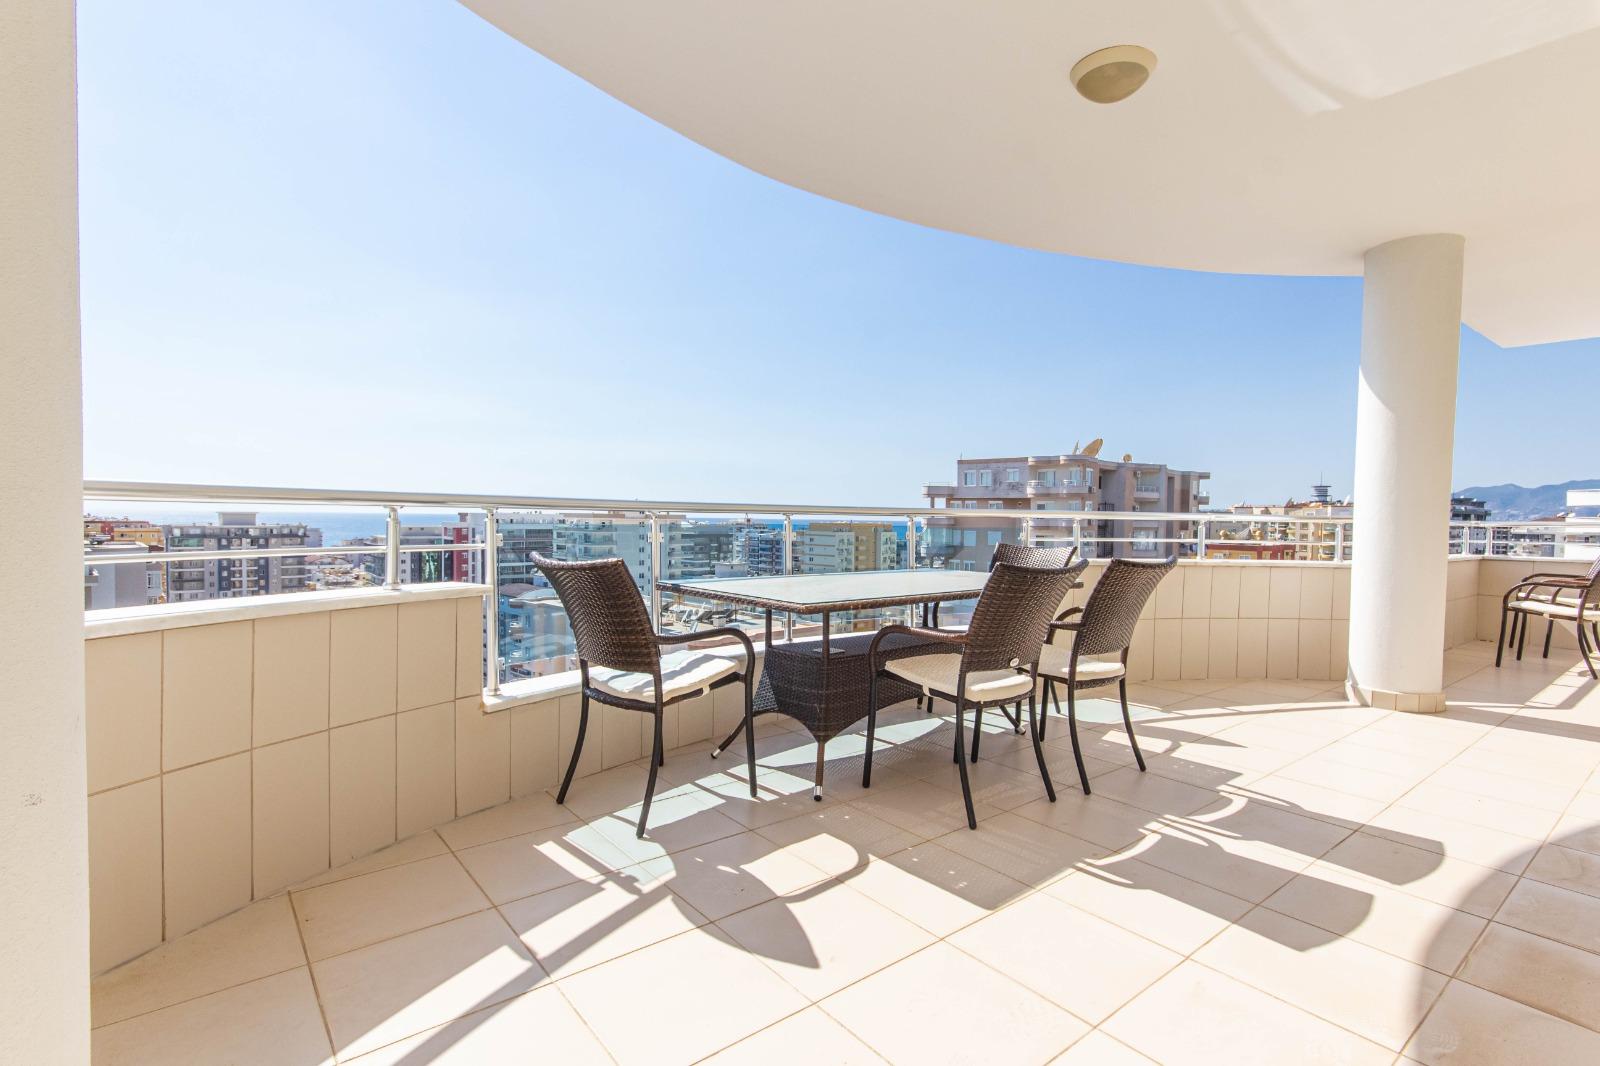 Меблированная квартира 2+1 с видом на море. - Фото 29